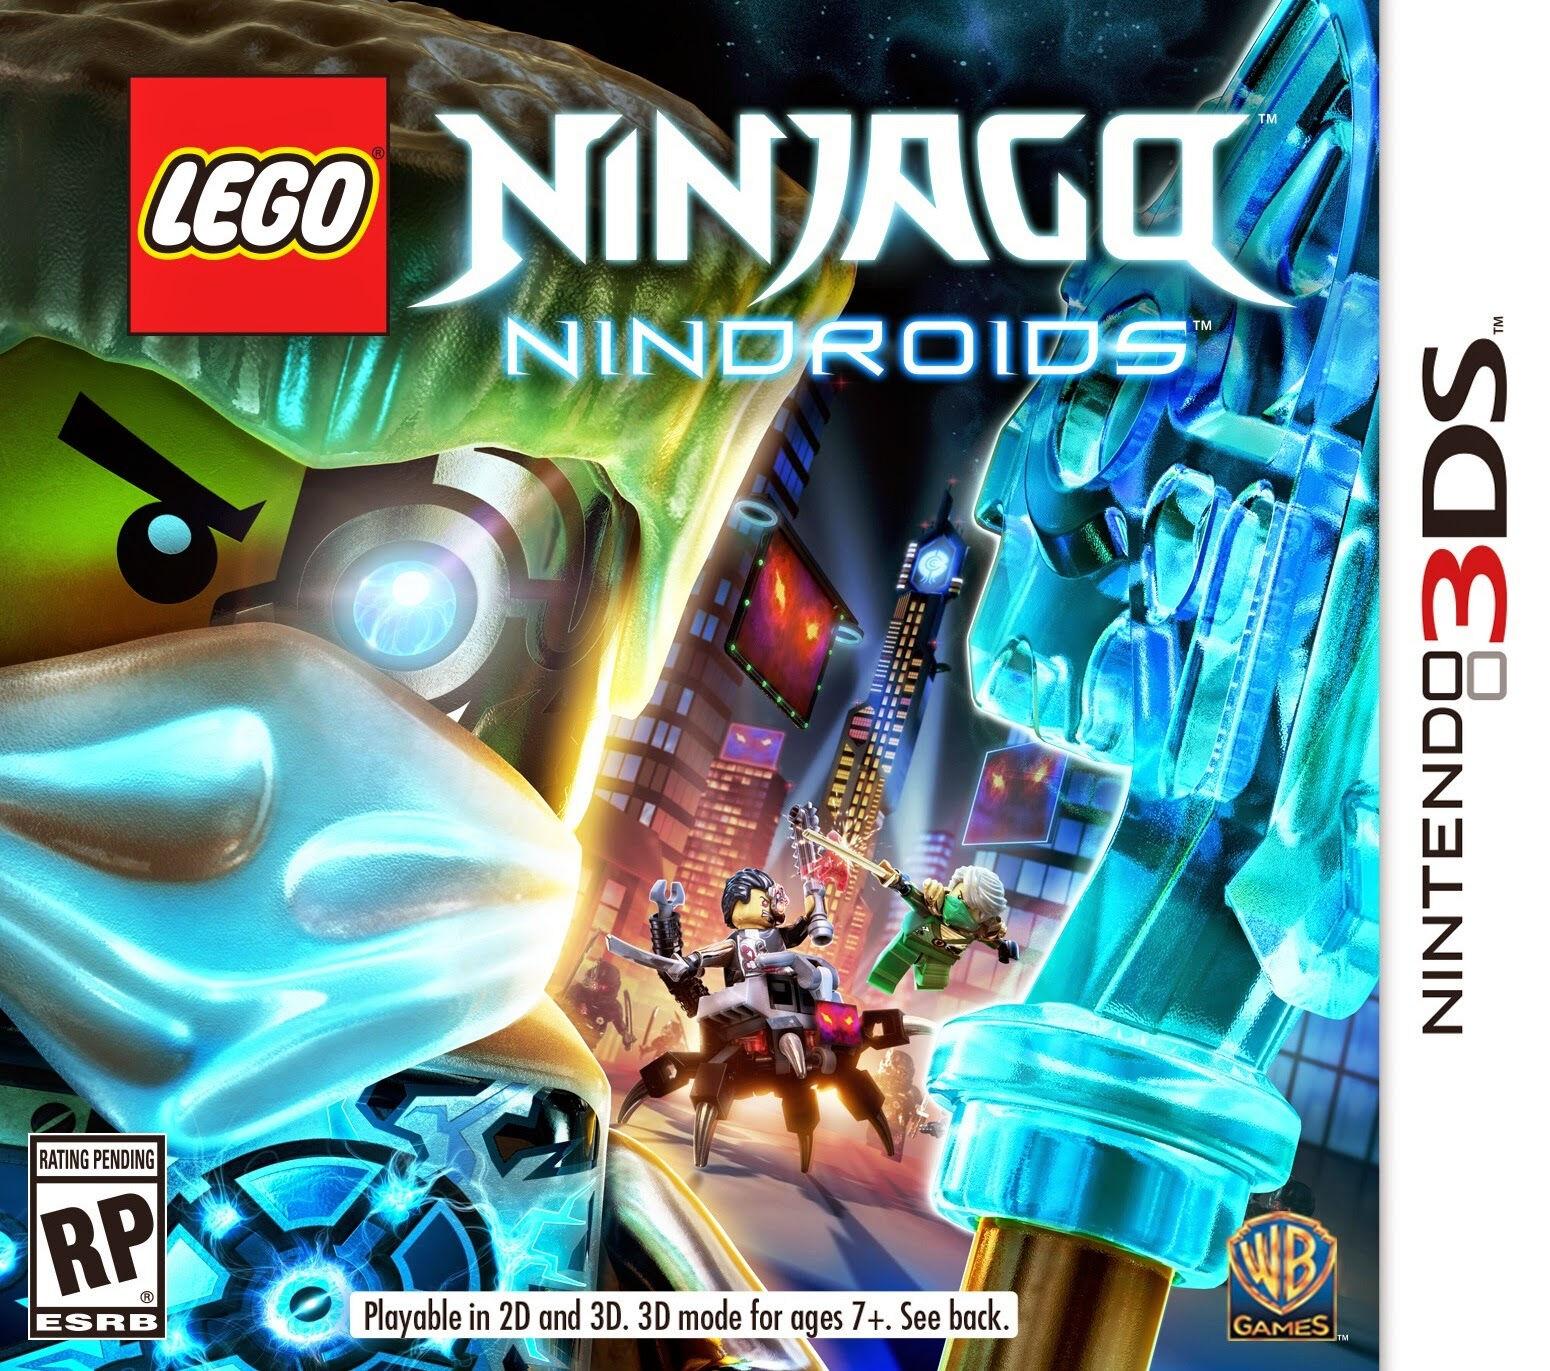 WARNER BROS.ENTERT. Warner Bros LEGO Ninjago: Nindroids, 3DS videogioco Nintendo 3DS Basic Inglese, ITA